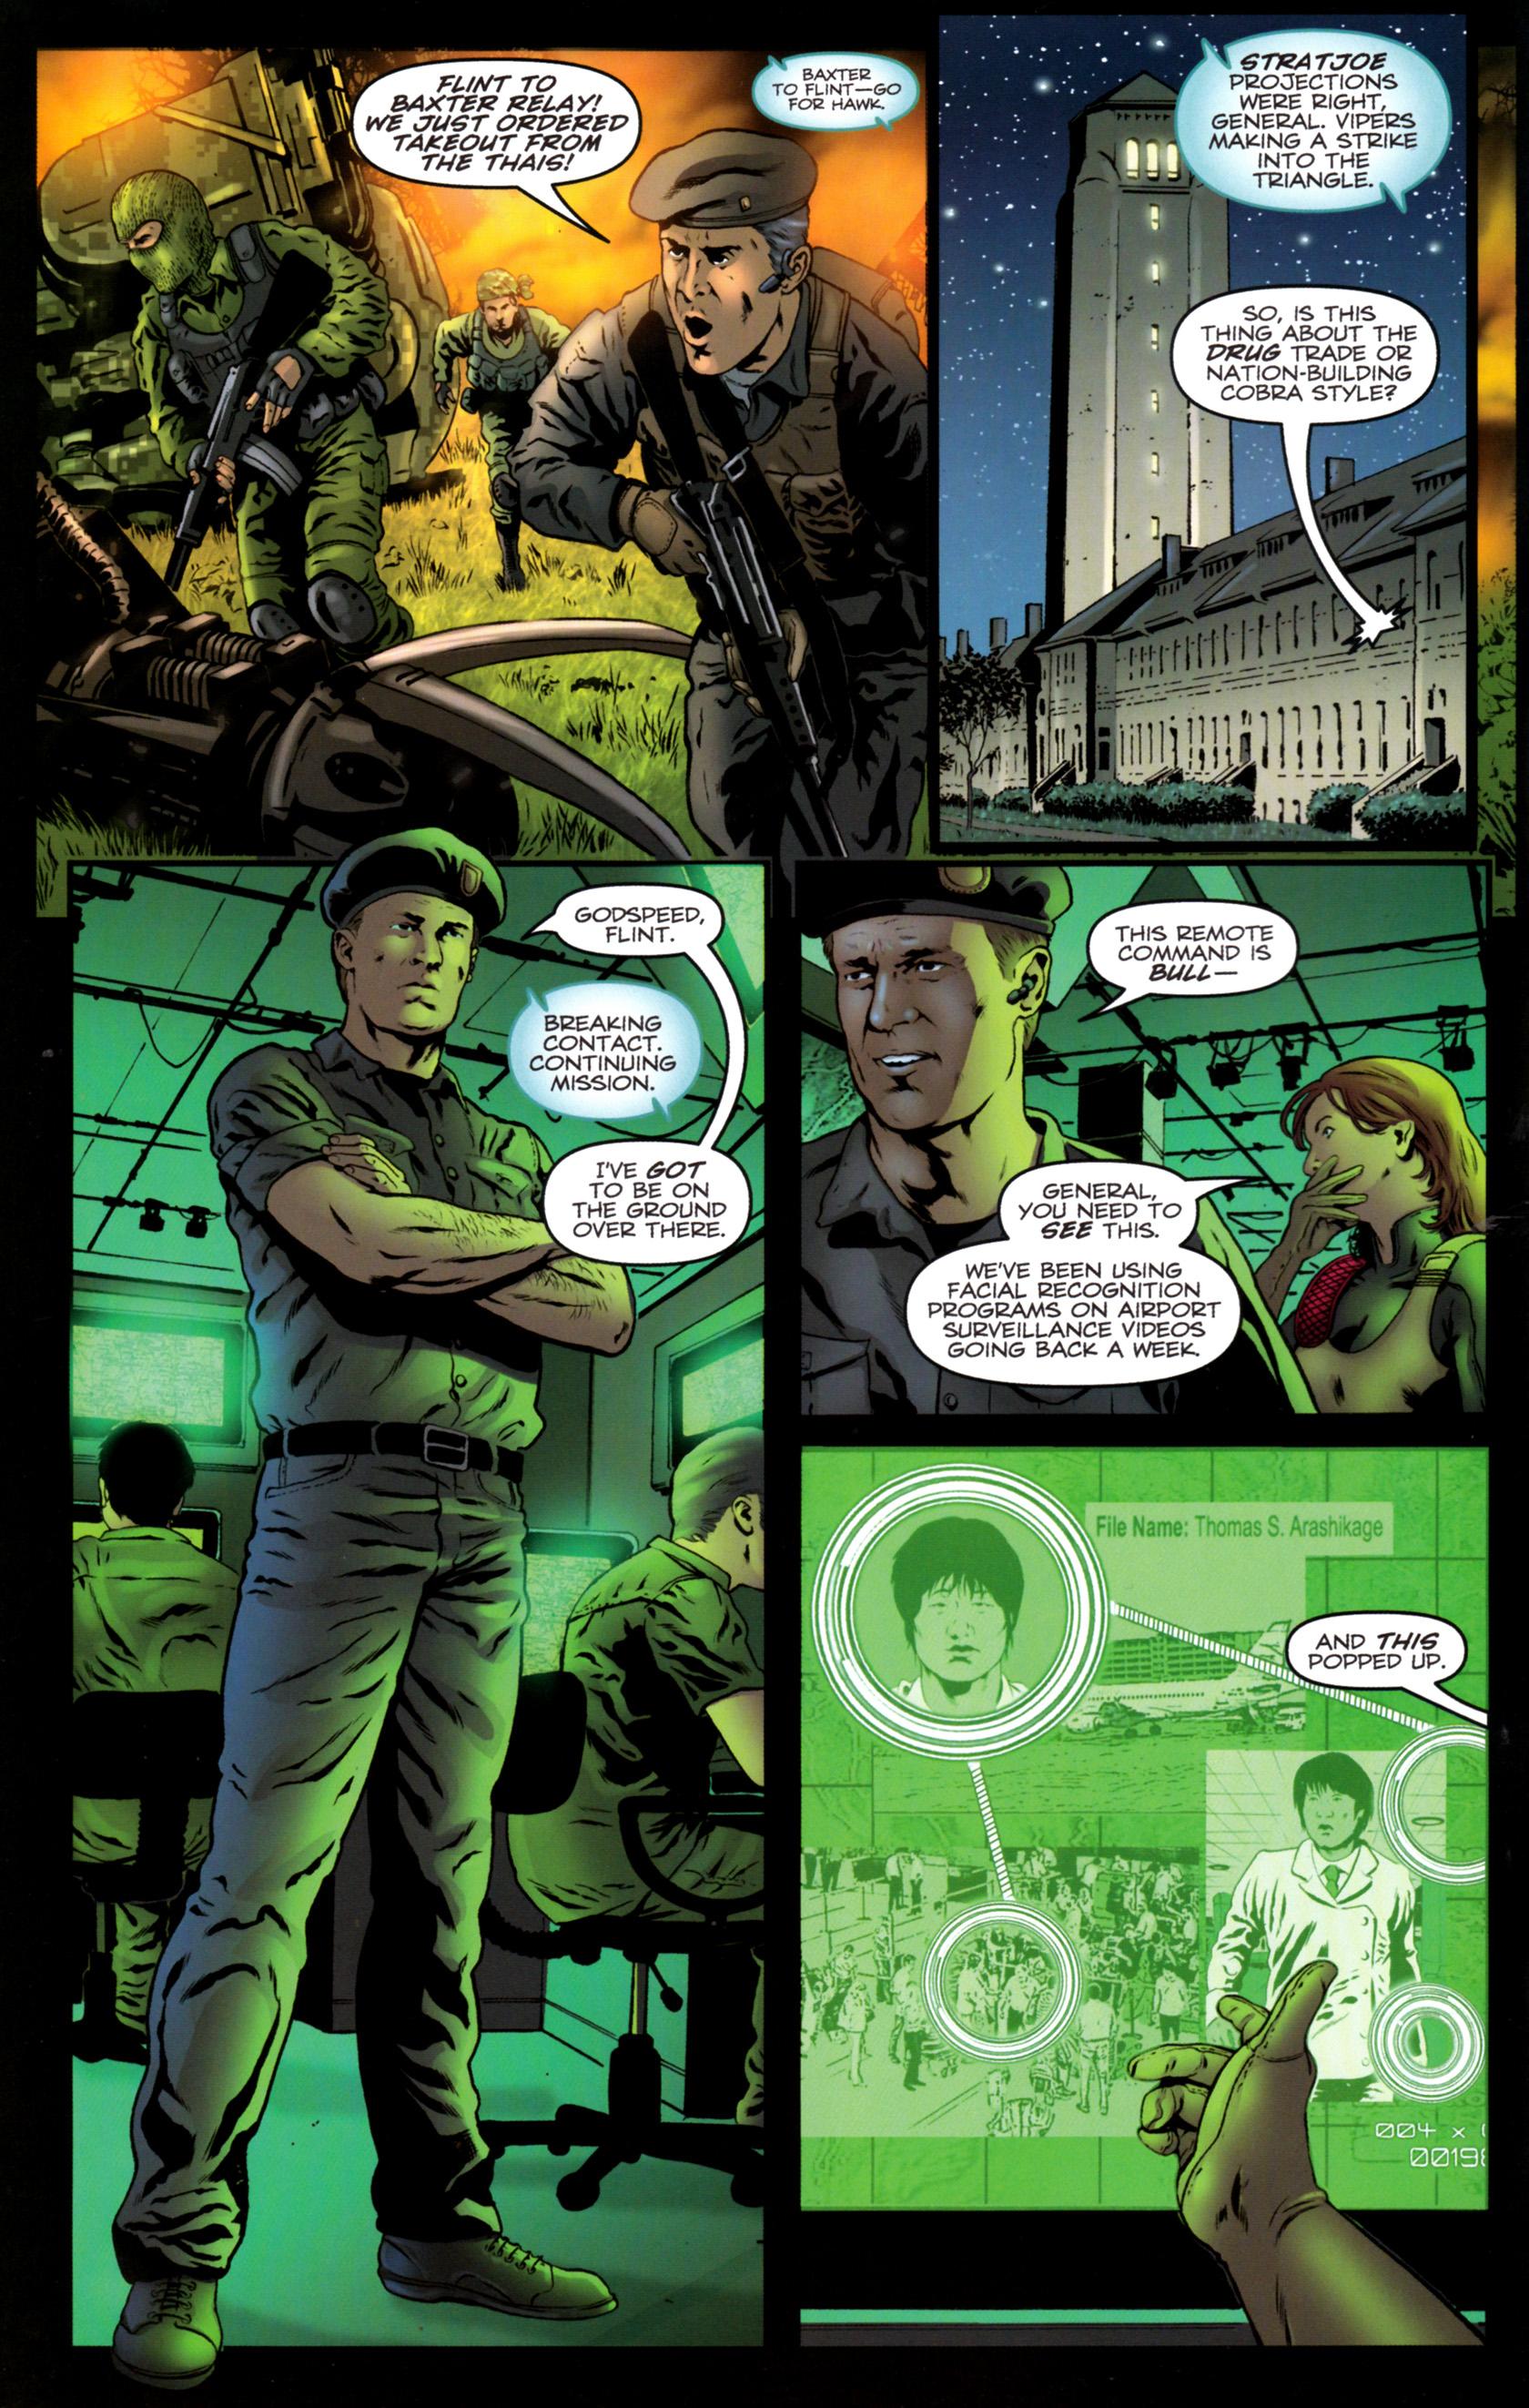 Read online G.I. Joe: Snake Eyes comic -  Issue #9 - 7